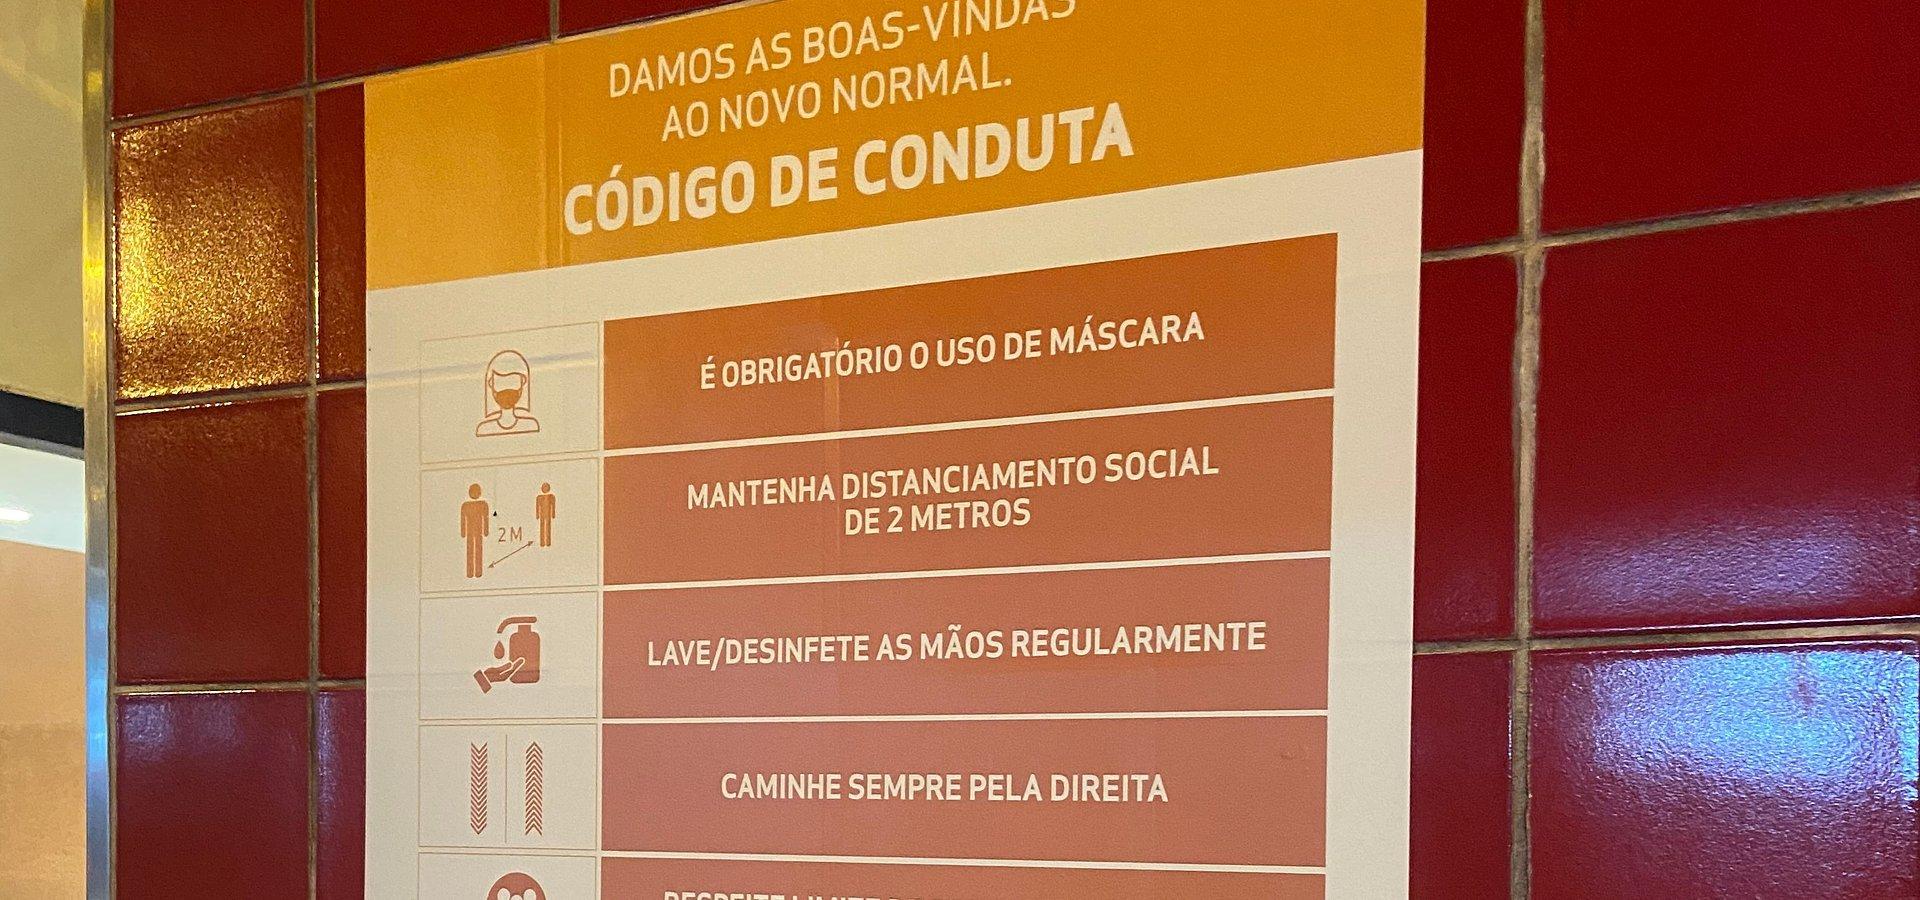 CoimbraShopping implementou medidas adicionais para garantir segurança de visitantes, lojistas, prestadores de serviços e colaboradores